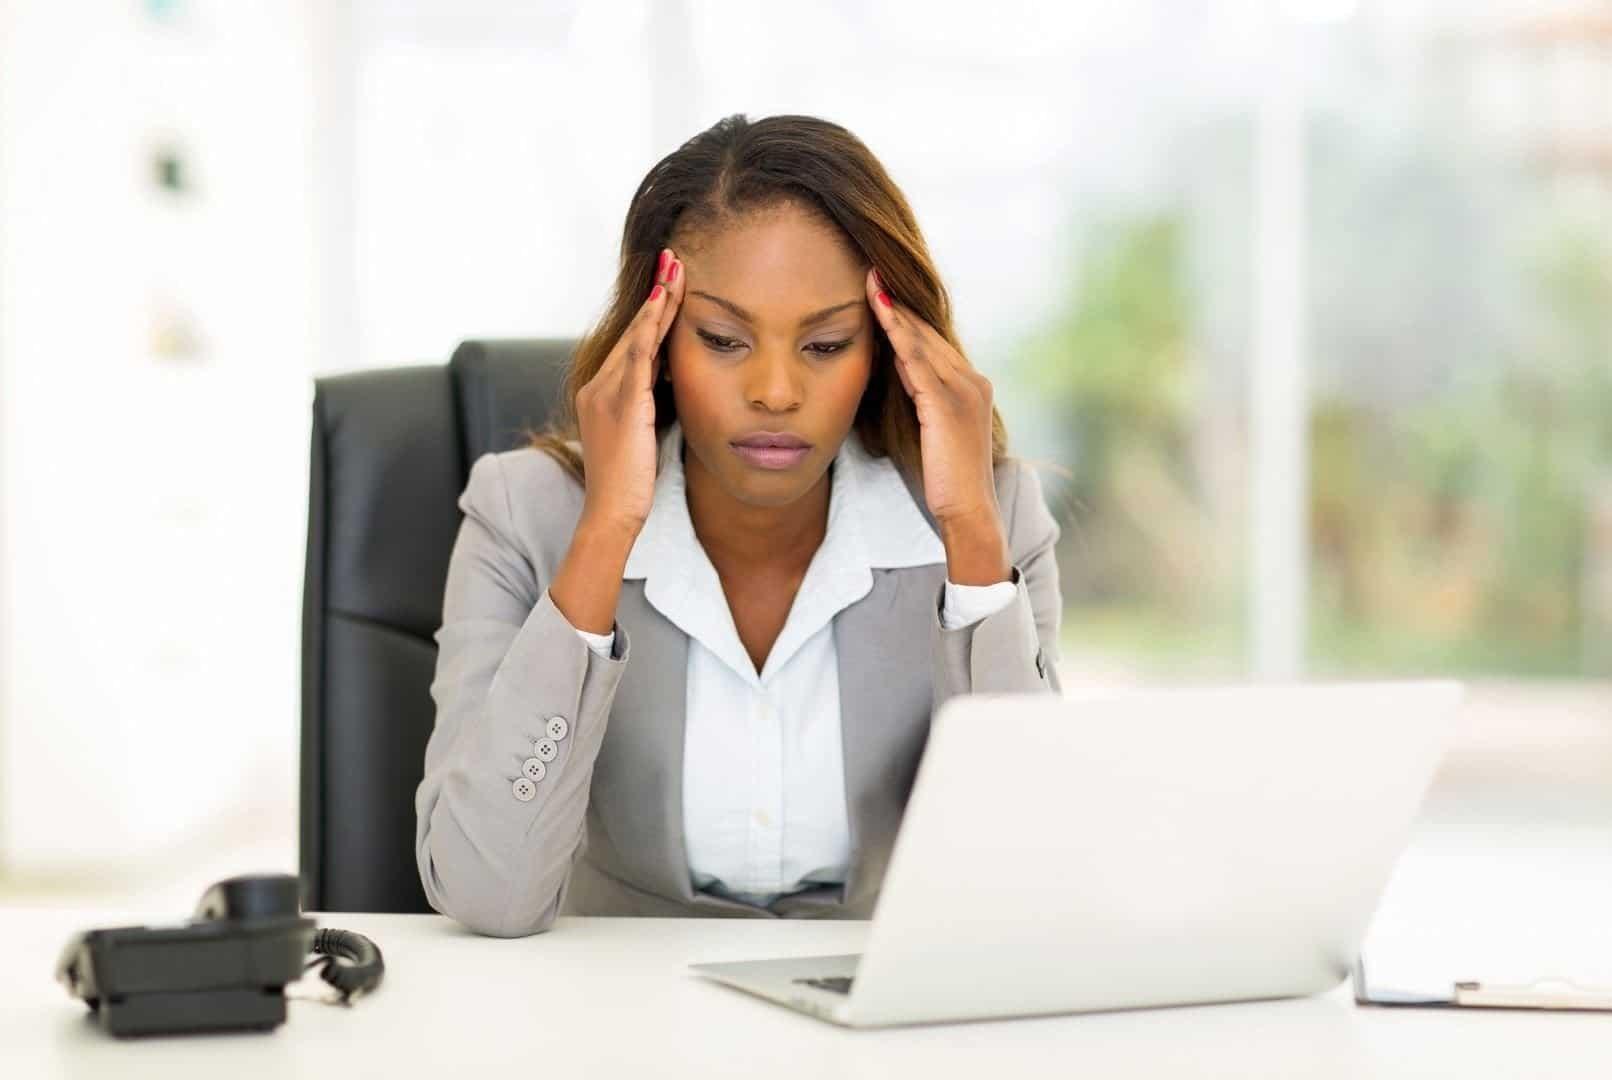 stress and endometriosis Gilbert AZ